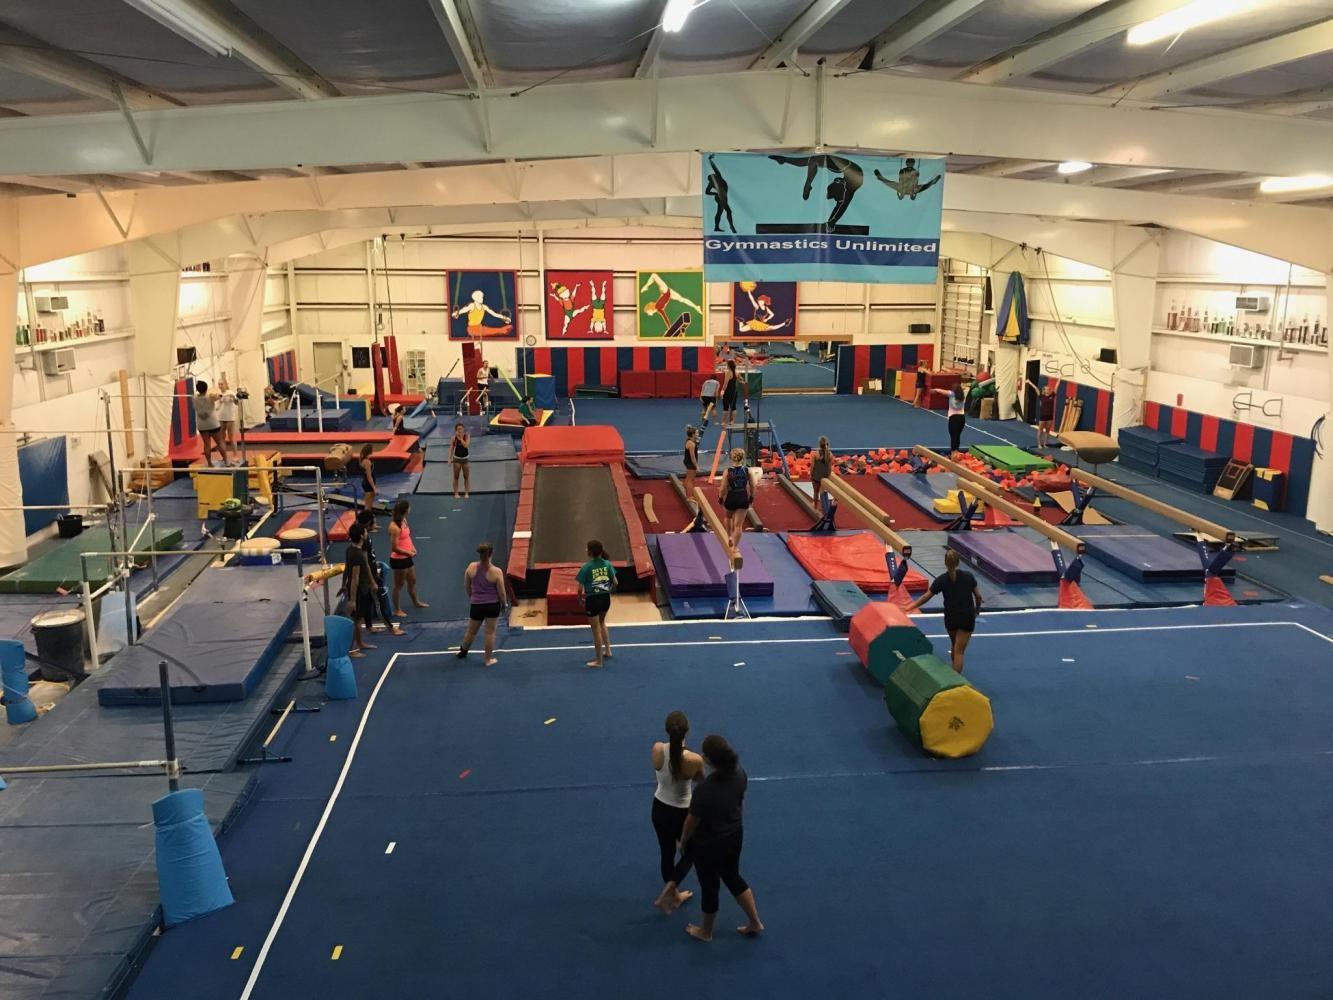 An overhead shot of Gymnastics Unlimited, the home gym of the UNCW Club Gymnastics team.